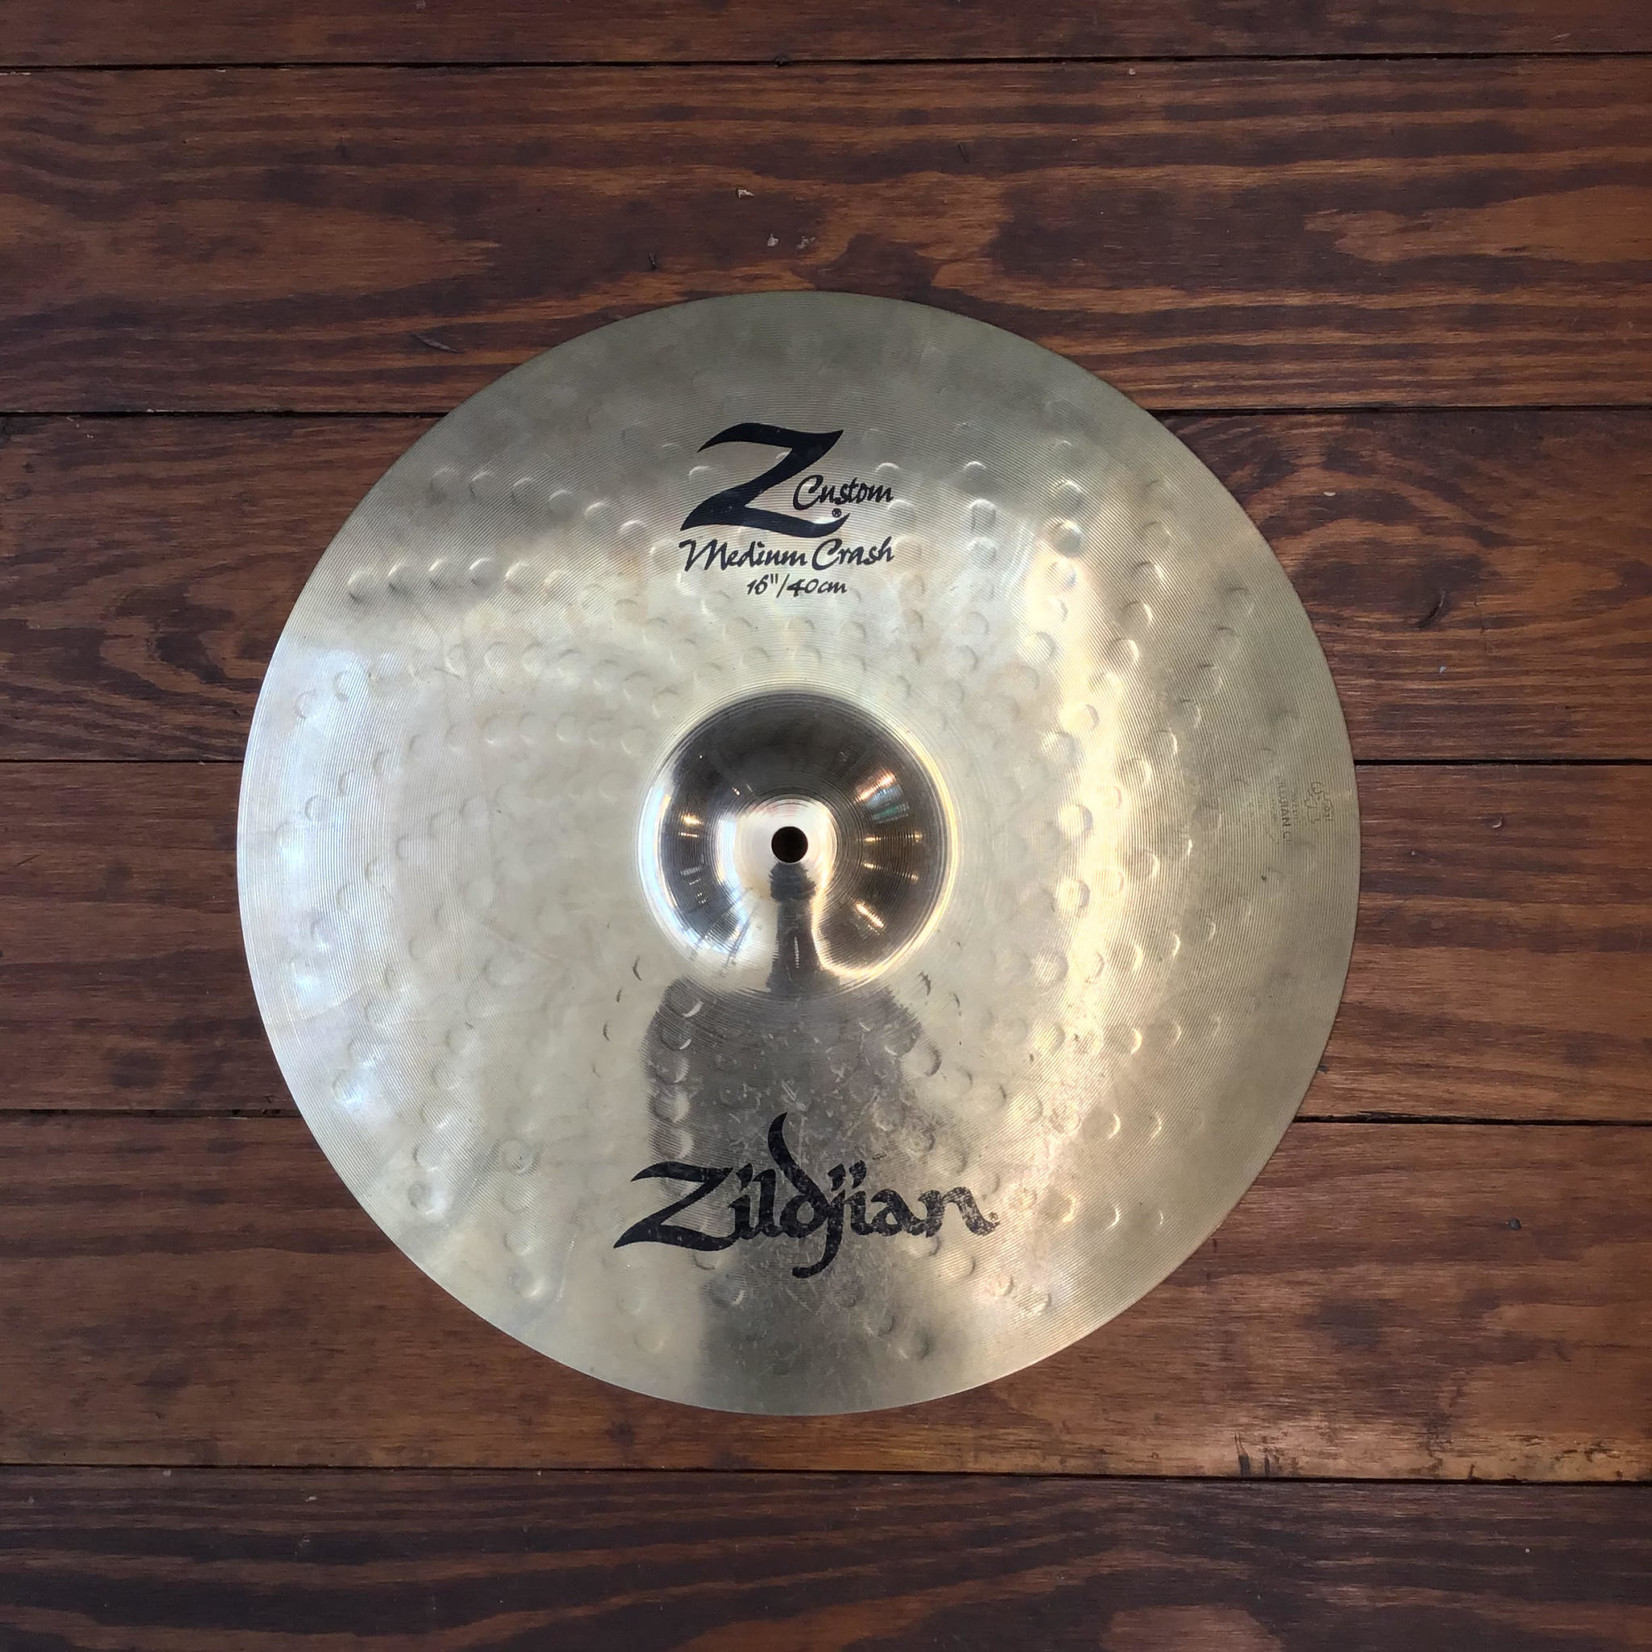 "Zildjian USED Zildjian Z Custom 16"" Medium Crash Cymbal"